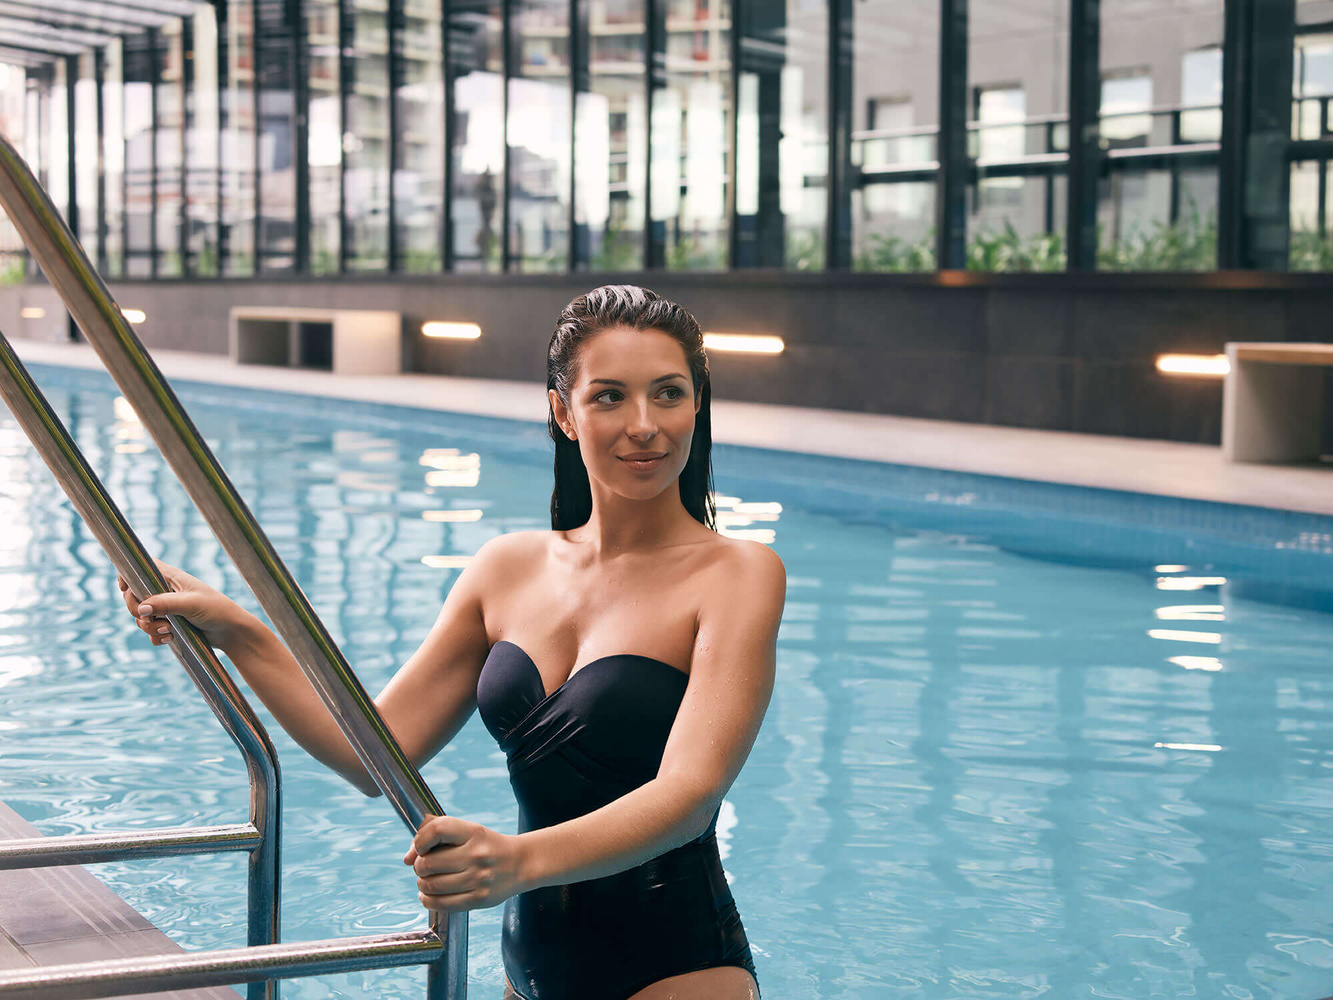 Dip in the pool by Kristian Gehradte